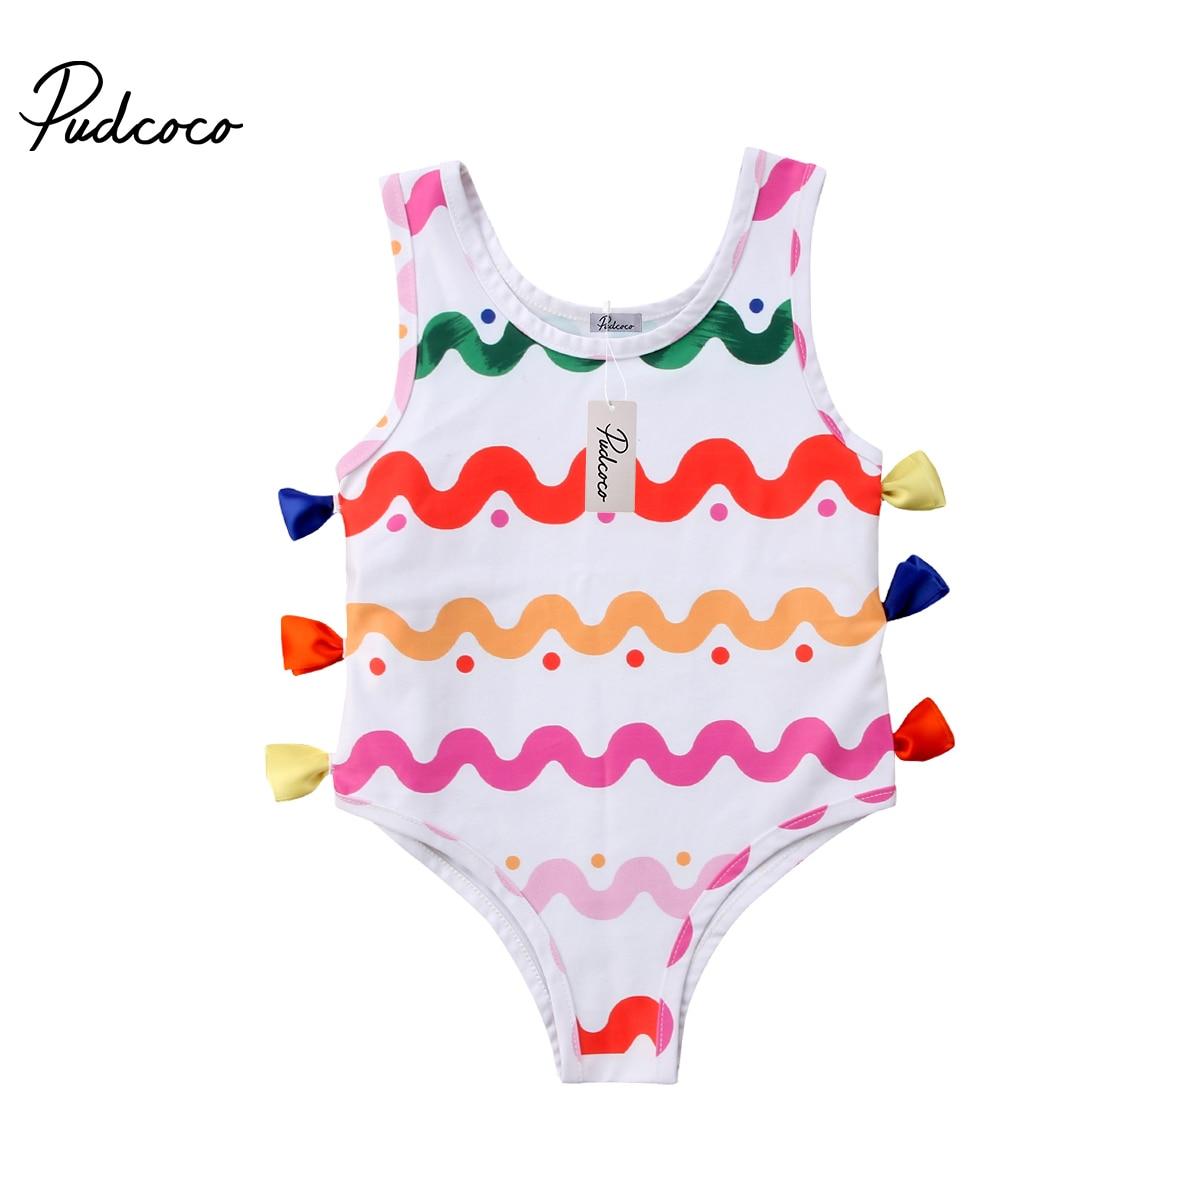 3d6c78add0 2018 Brand New Toddler Infant Newborn Kid Baby Girl Swimsuit Romper Bikini  Swimwear Bathing Suit Colorful Striped Beachwear 0-3T